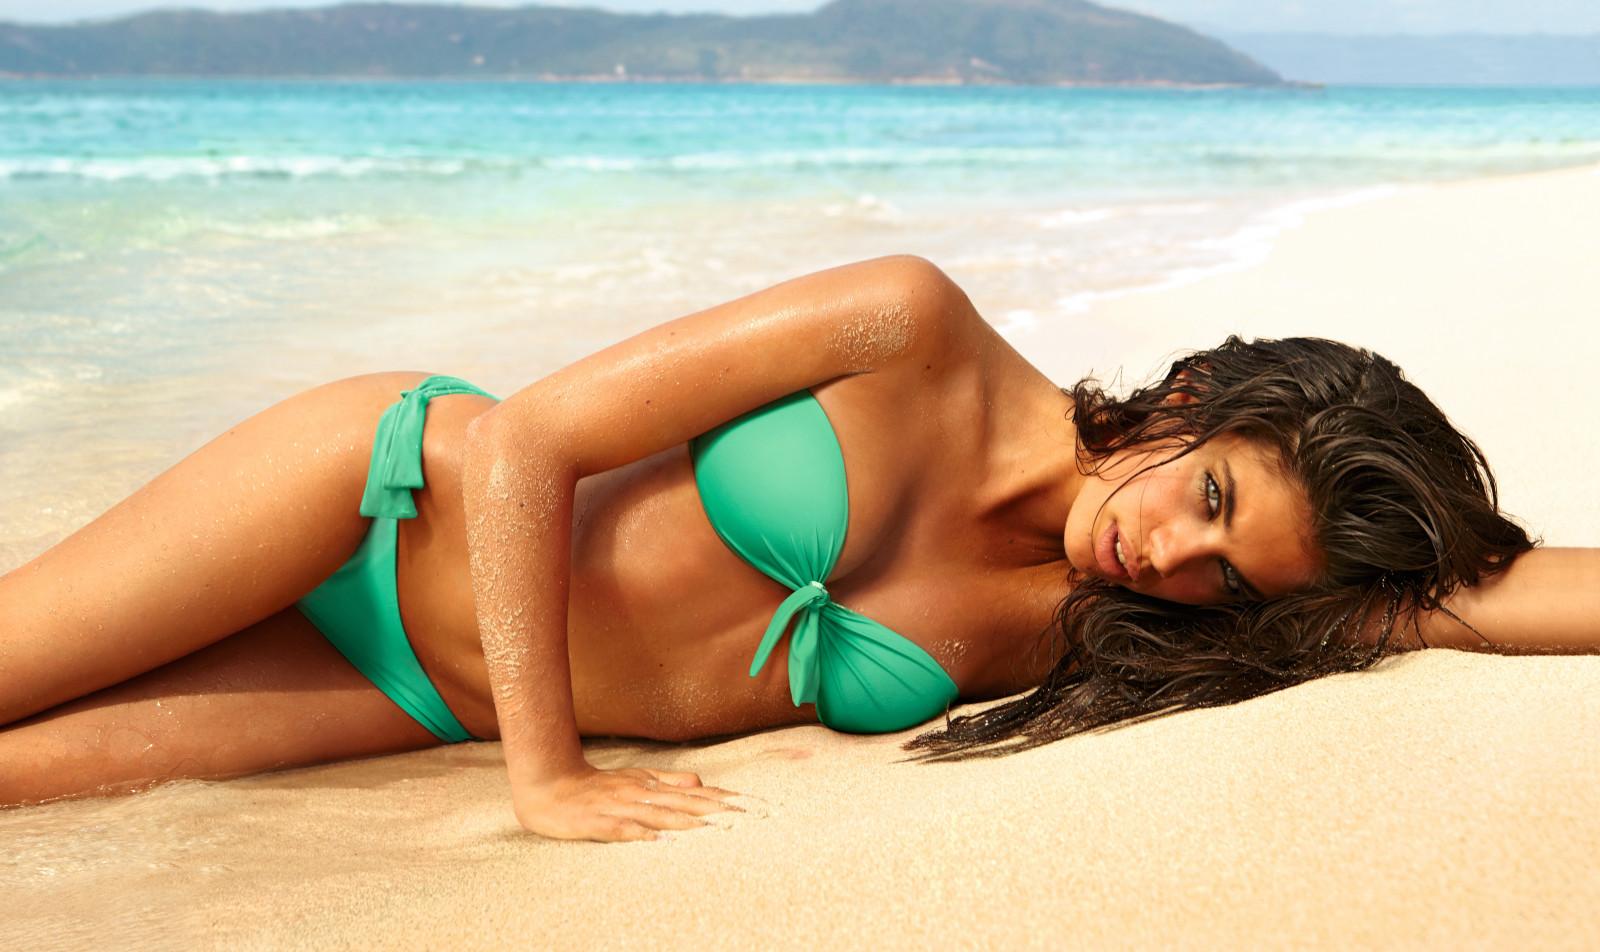 bikini-model-beach-pictures